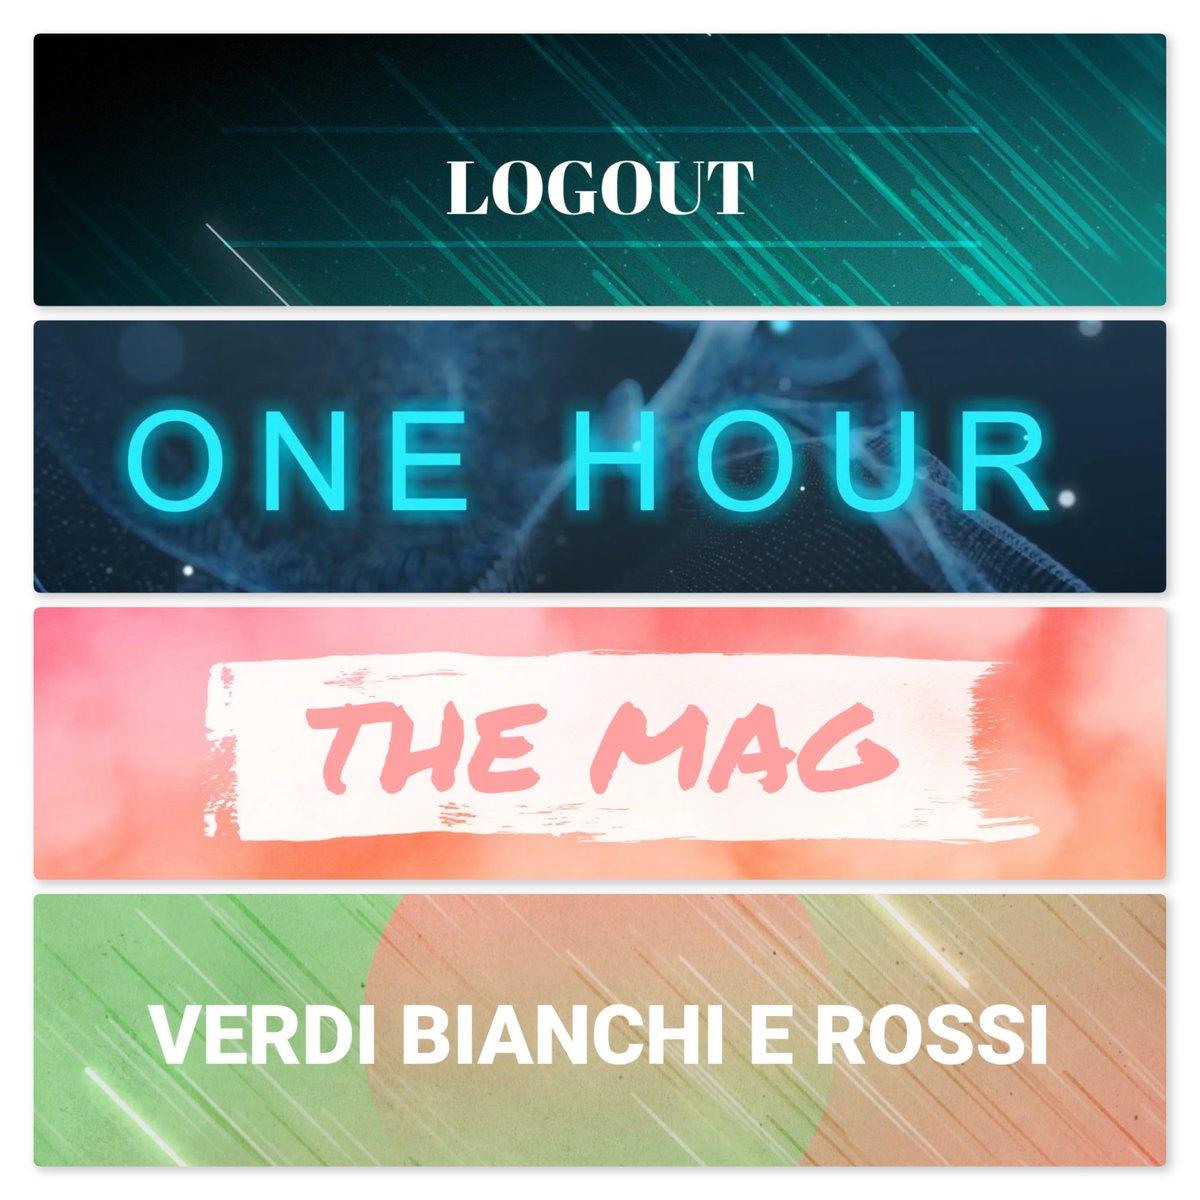 Pronti ad iniziare una nuova giornata insieme?  Dalle 8:00: LOGOUT - VERDI BIANCHI ROSSI - ONE HOUR - THE MAG   #radiofm #radiofmfaleria #artiste #beat #beats #bestsong #bumpin #love #TFLers #tweegram